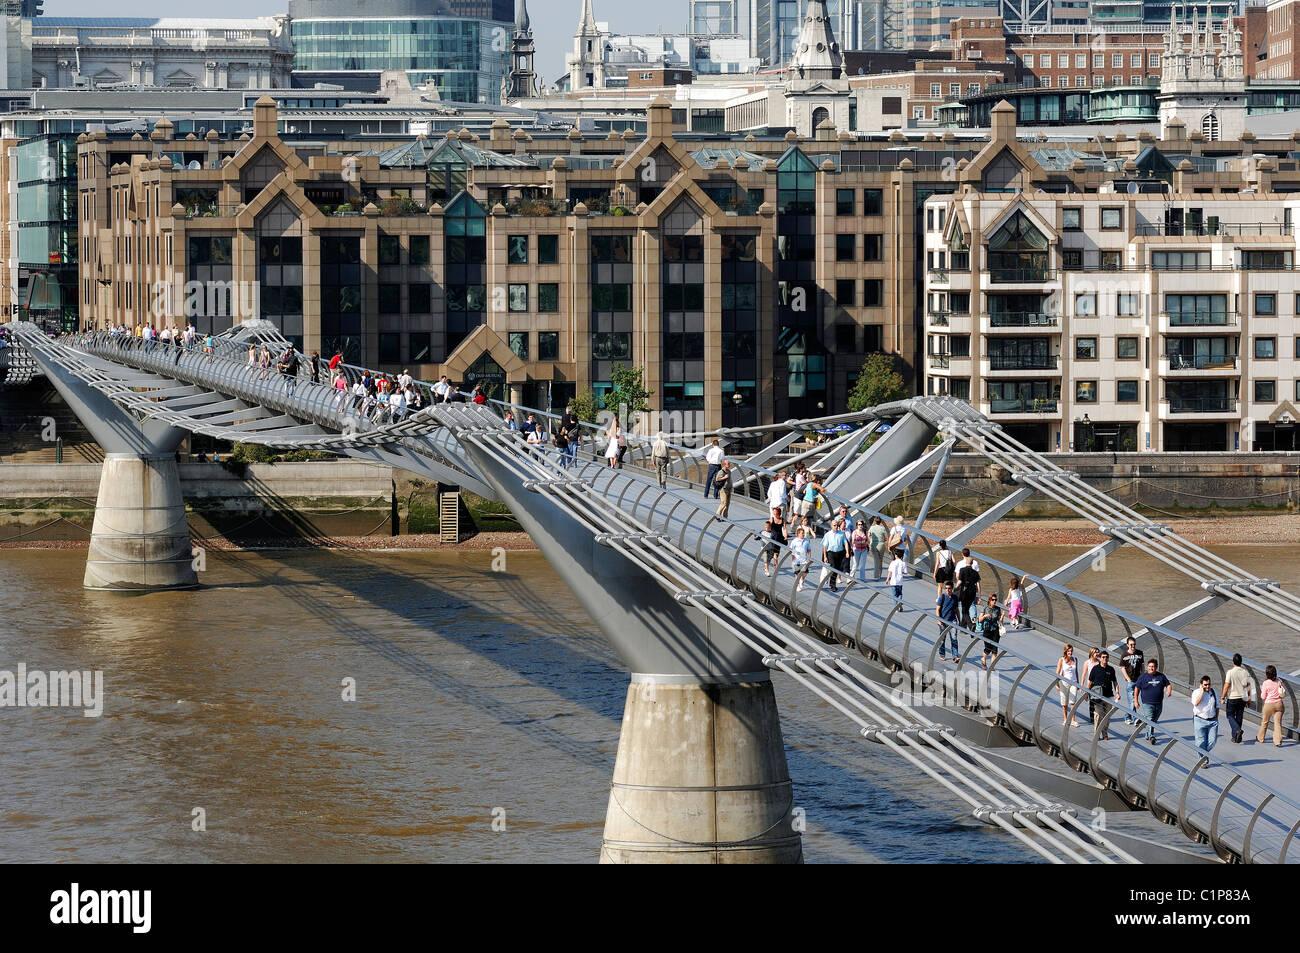 united kingdom london the city millenium bridge by norman foster stock image